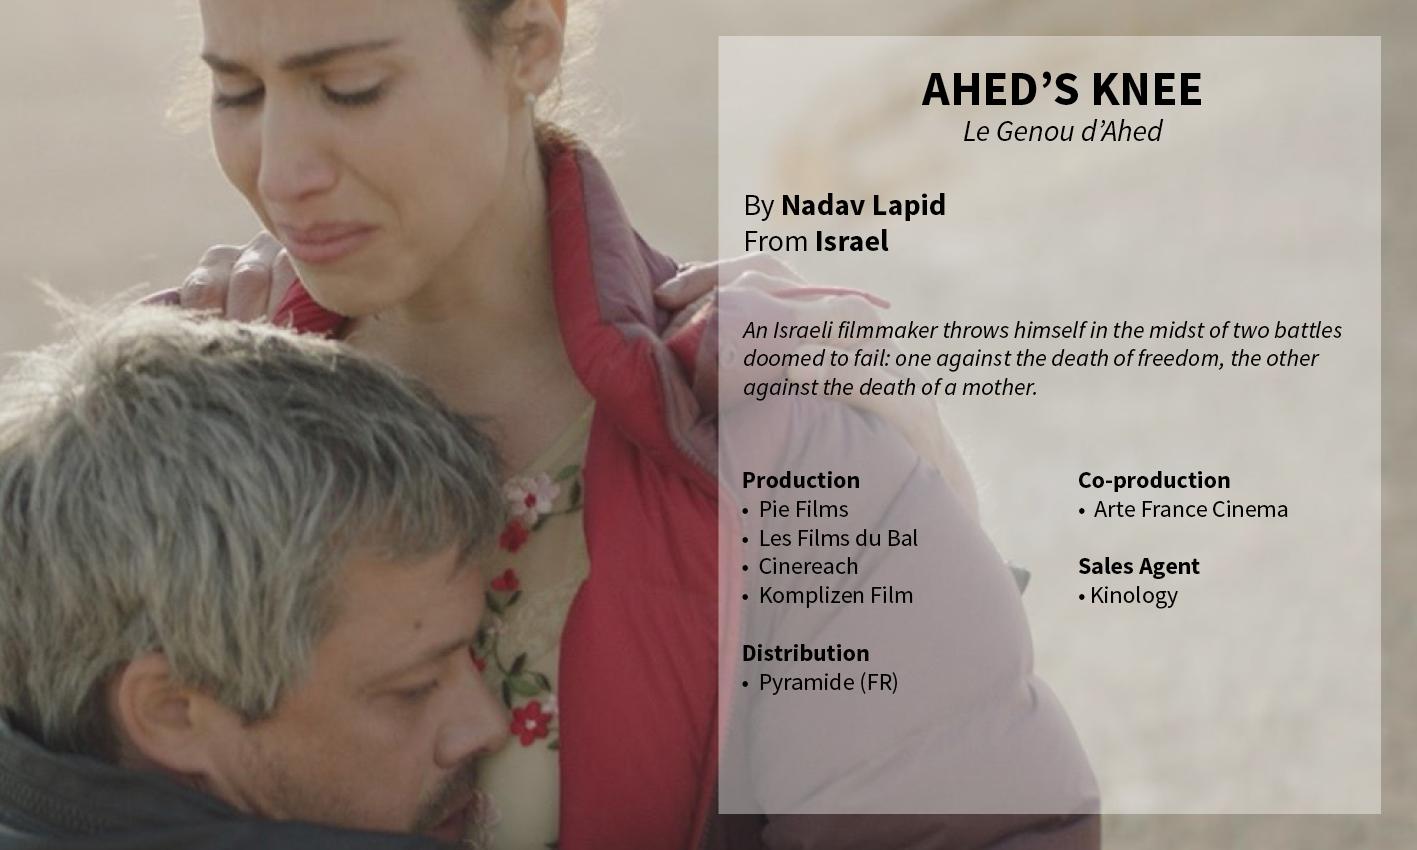 Ahed's Knee Nadav Lapid